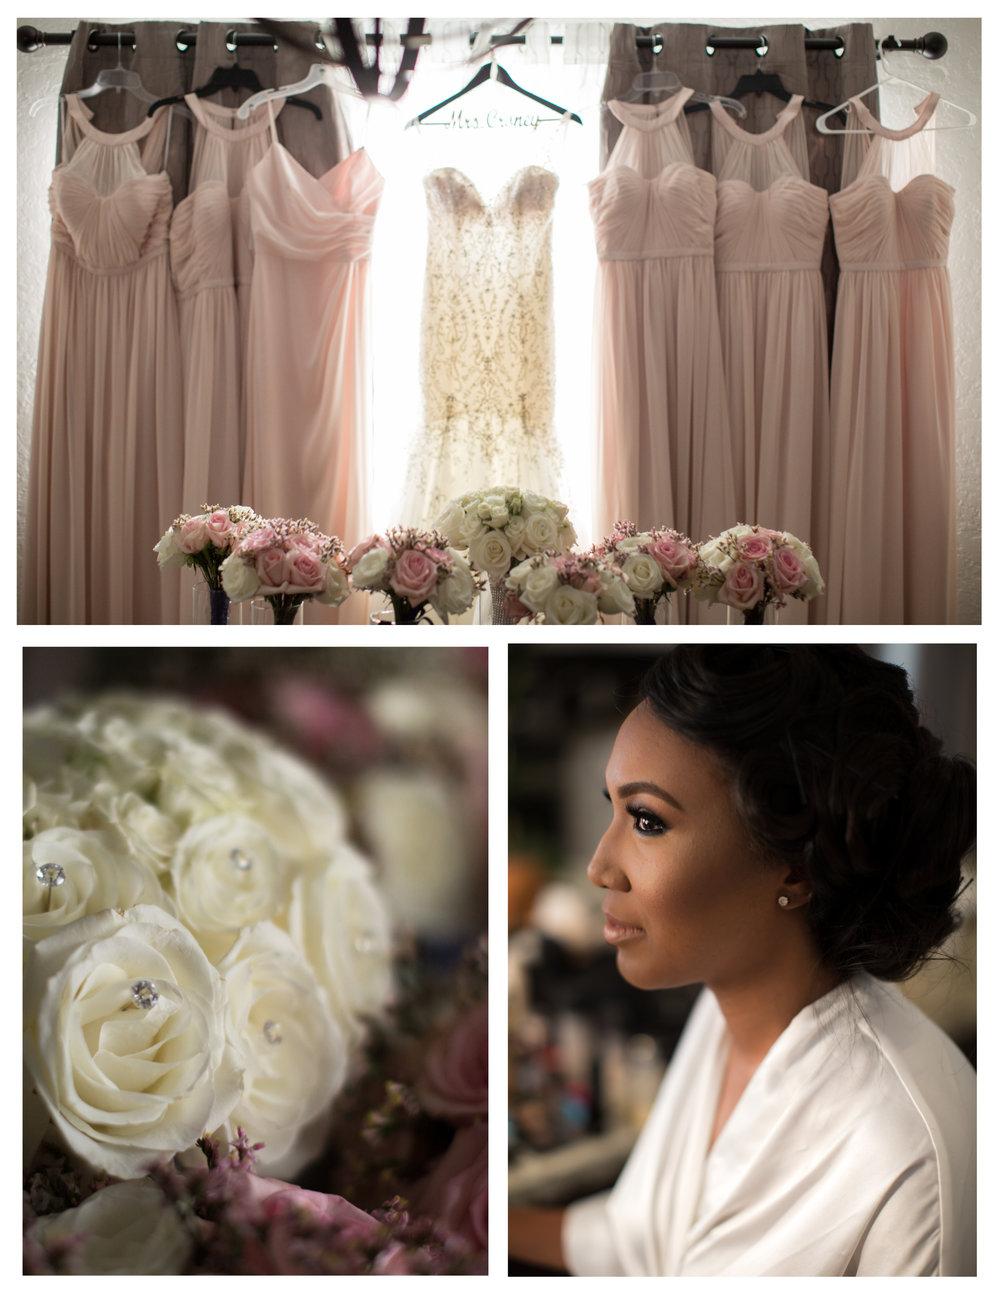 Benvenuto_wedding_Boynton_Beach_Jodi_Fjelde_Photography_Nikki_Otis_married_3.jpg